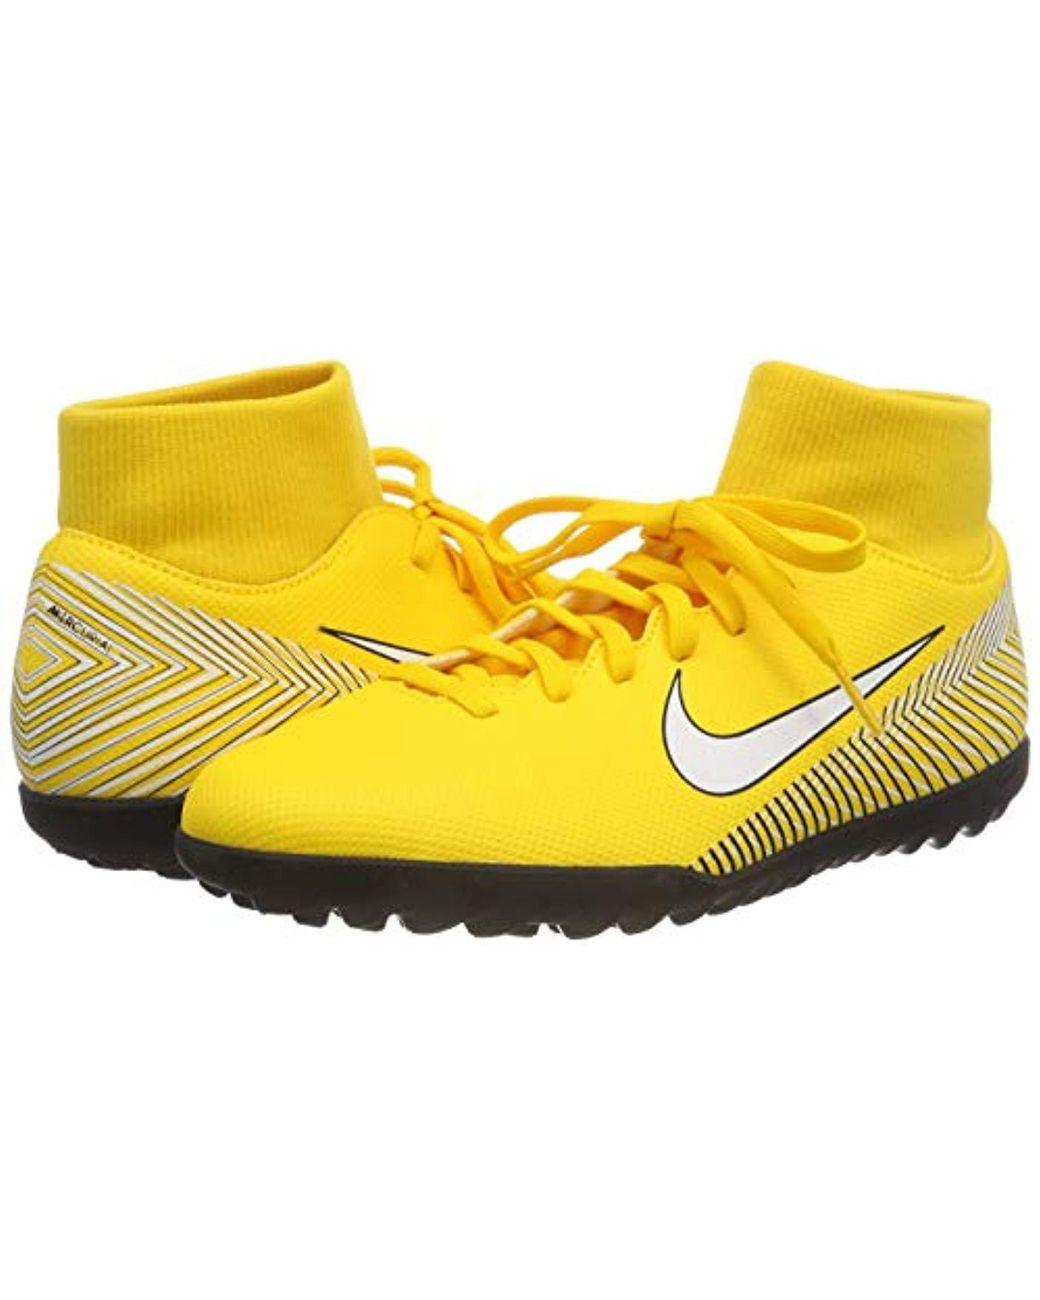 Njr Nike 6 IcChaussures Club Superfly UzpqSVM